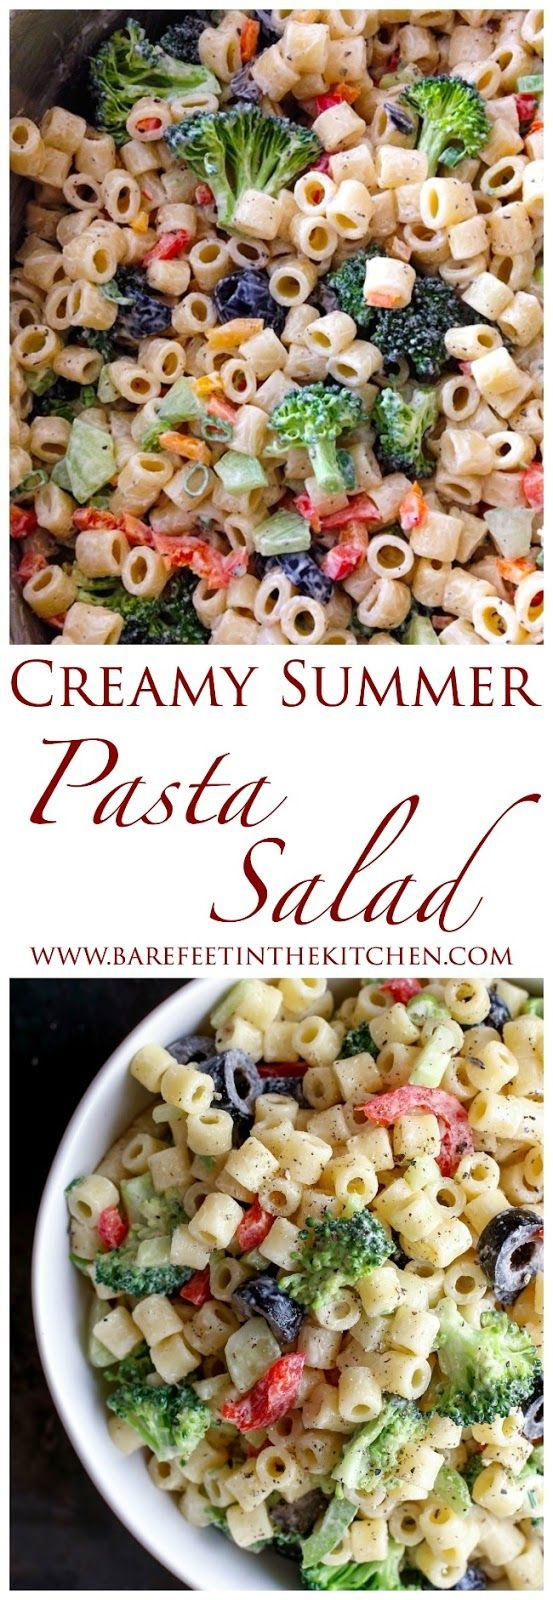 Creamy Summer Pasta Salad - get the recipe at barefeetinthekitchen.com